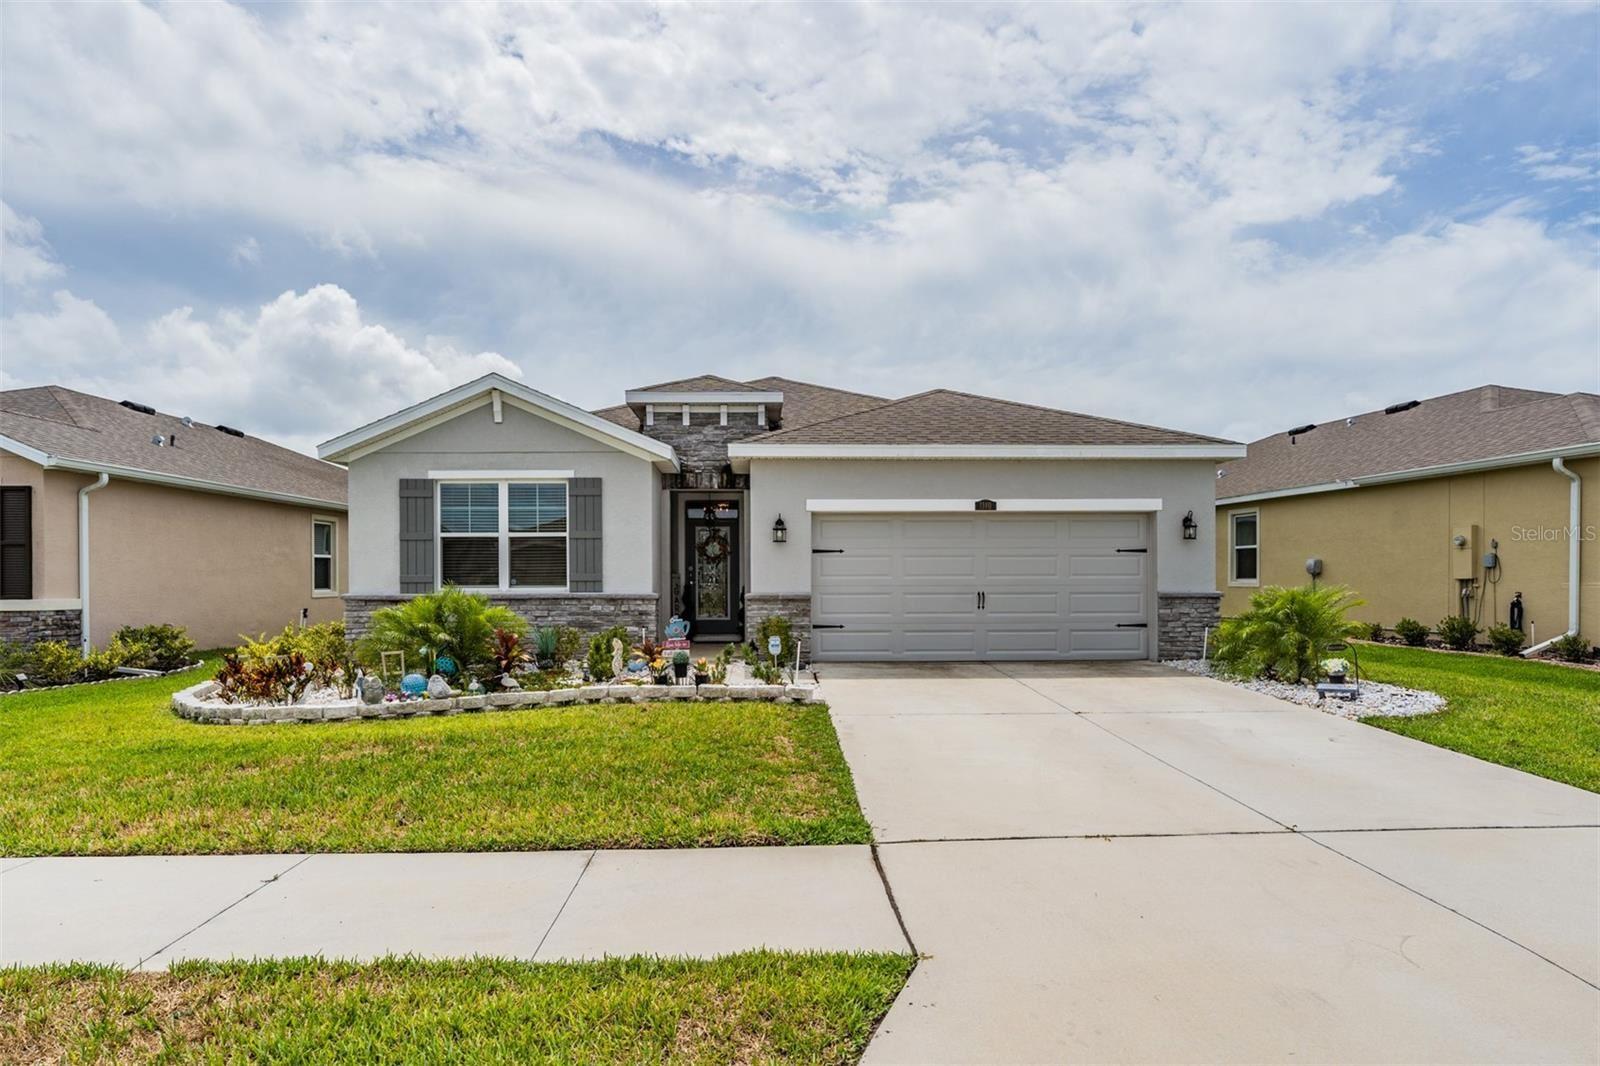 1140 PIPESTONE PLACE, Wesley Chapel, FL 33543 - MLS#: U8125951